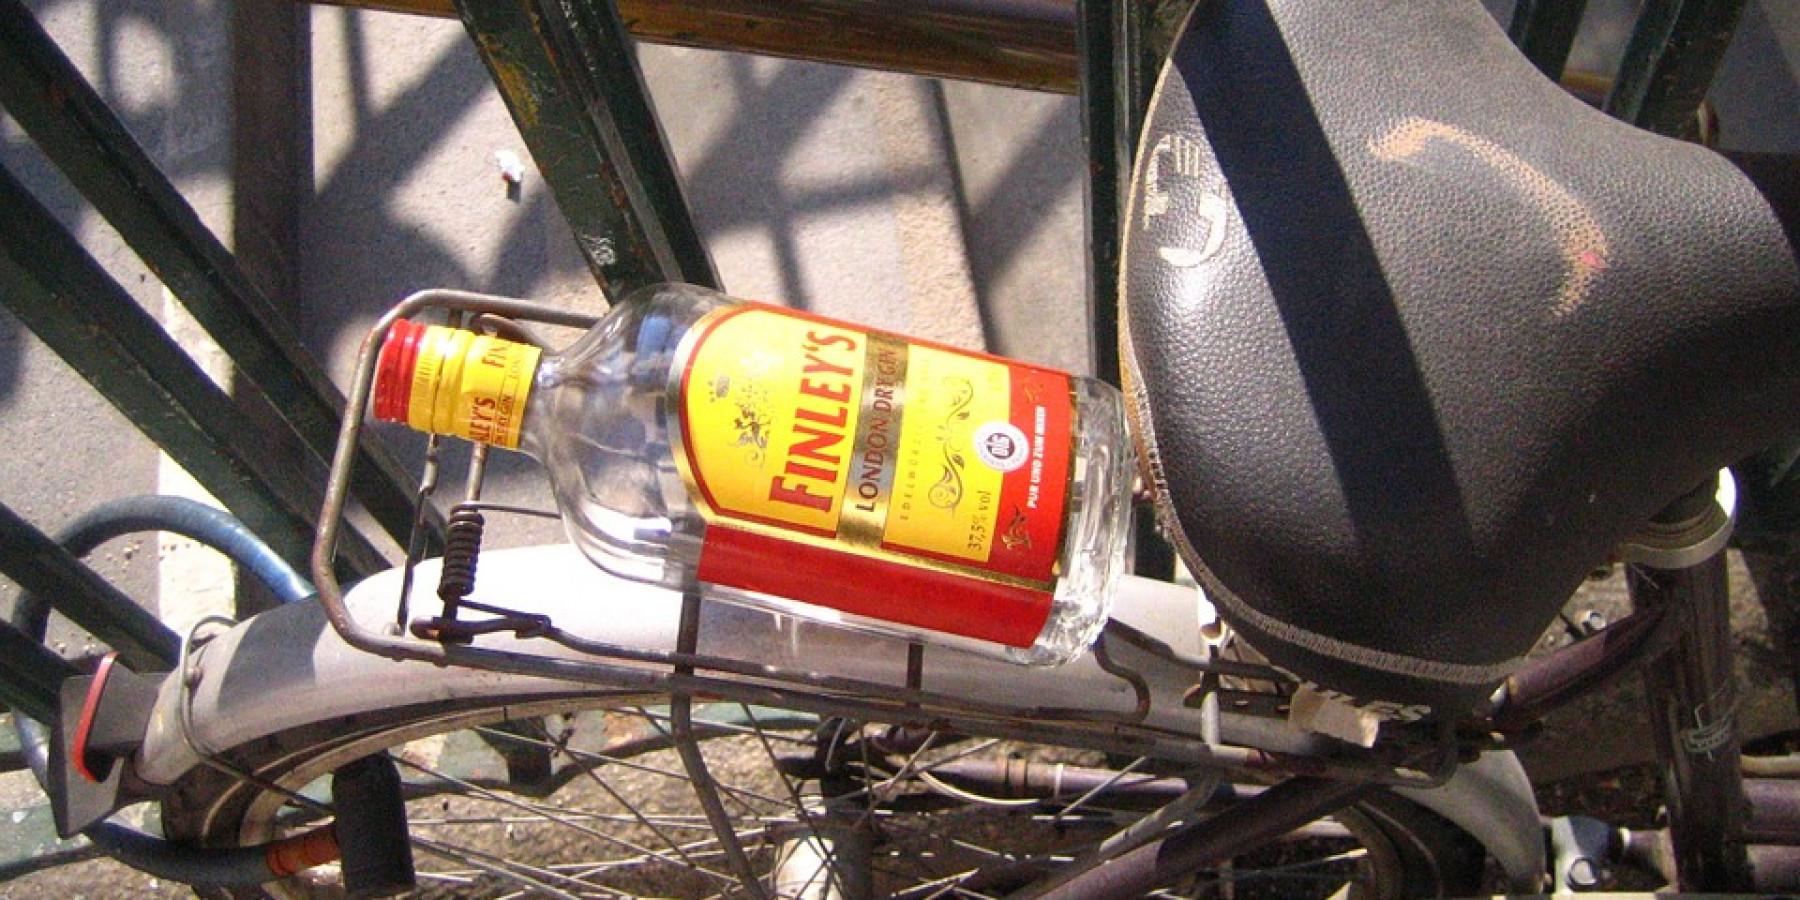 Trunkenheit im Straßenverkehr